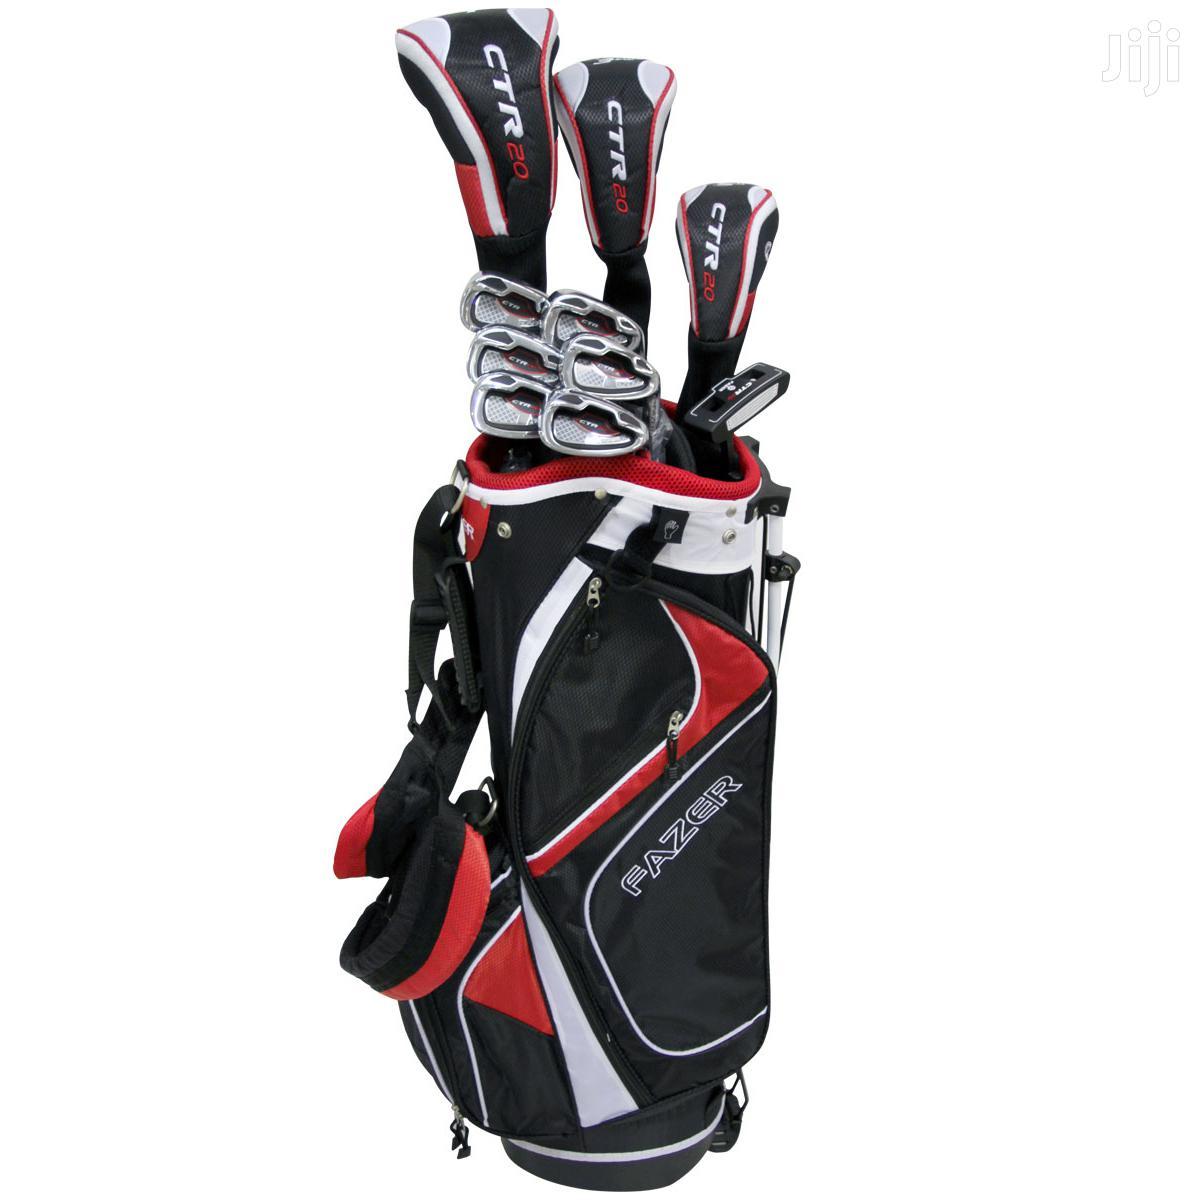 New Adult Golf Club Sets